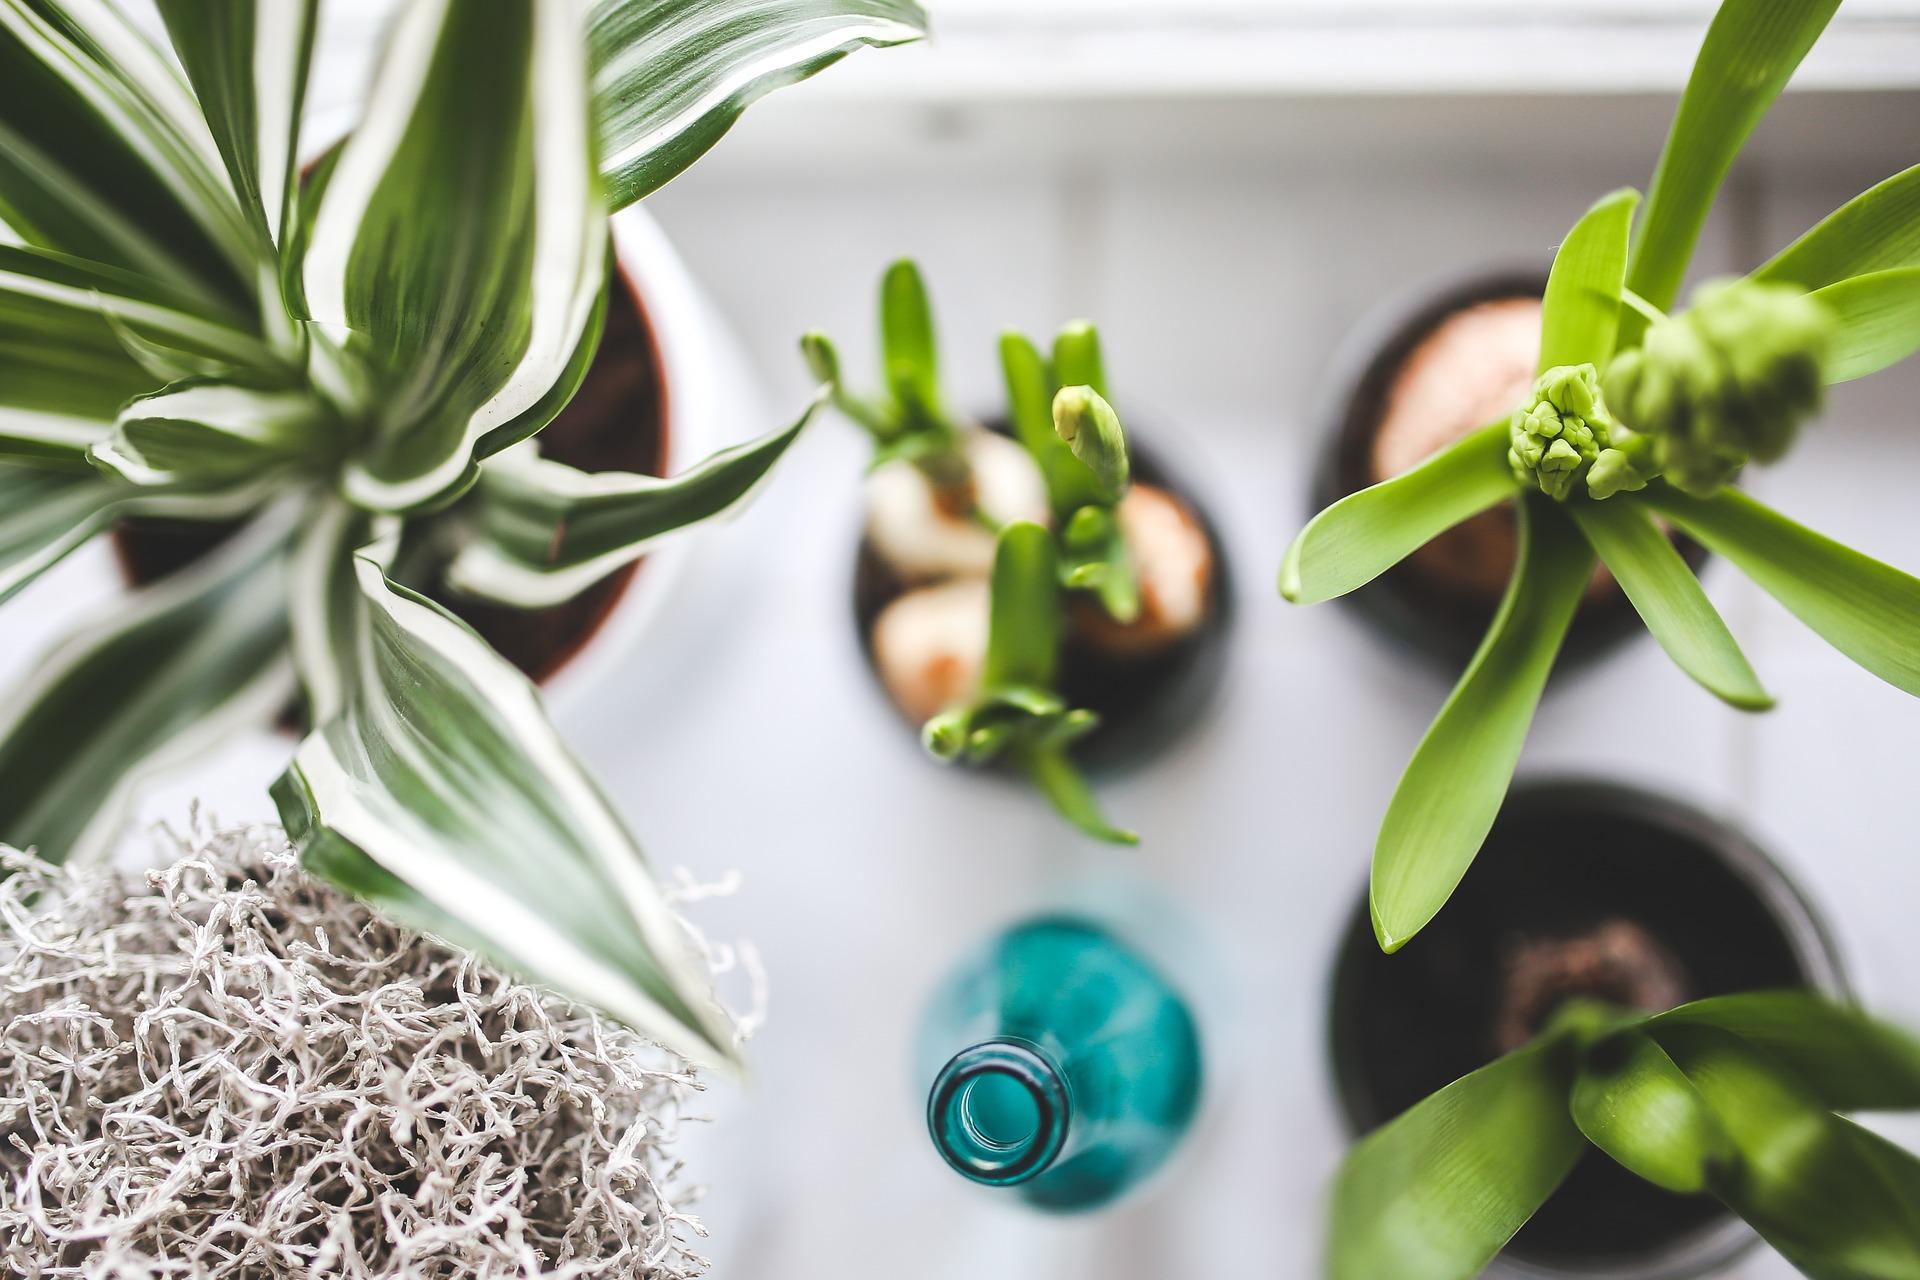 An array of houseplants